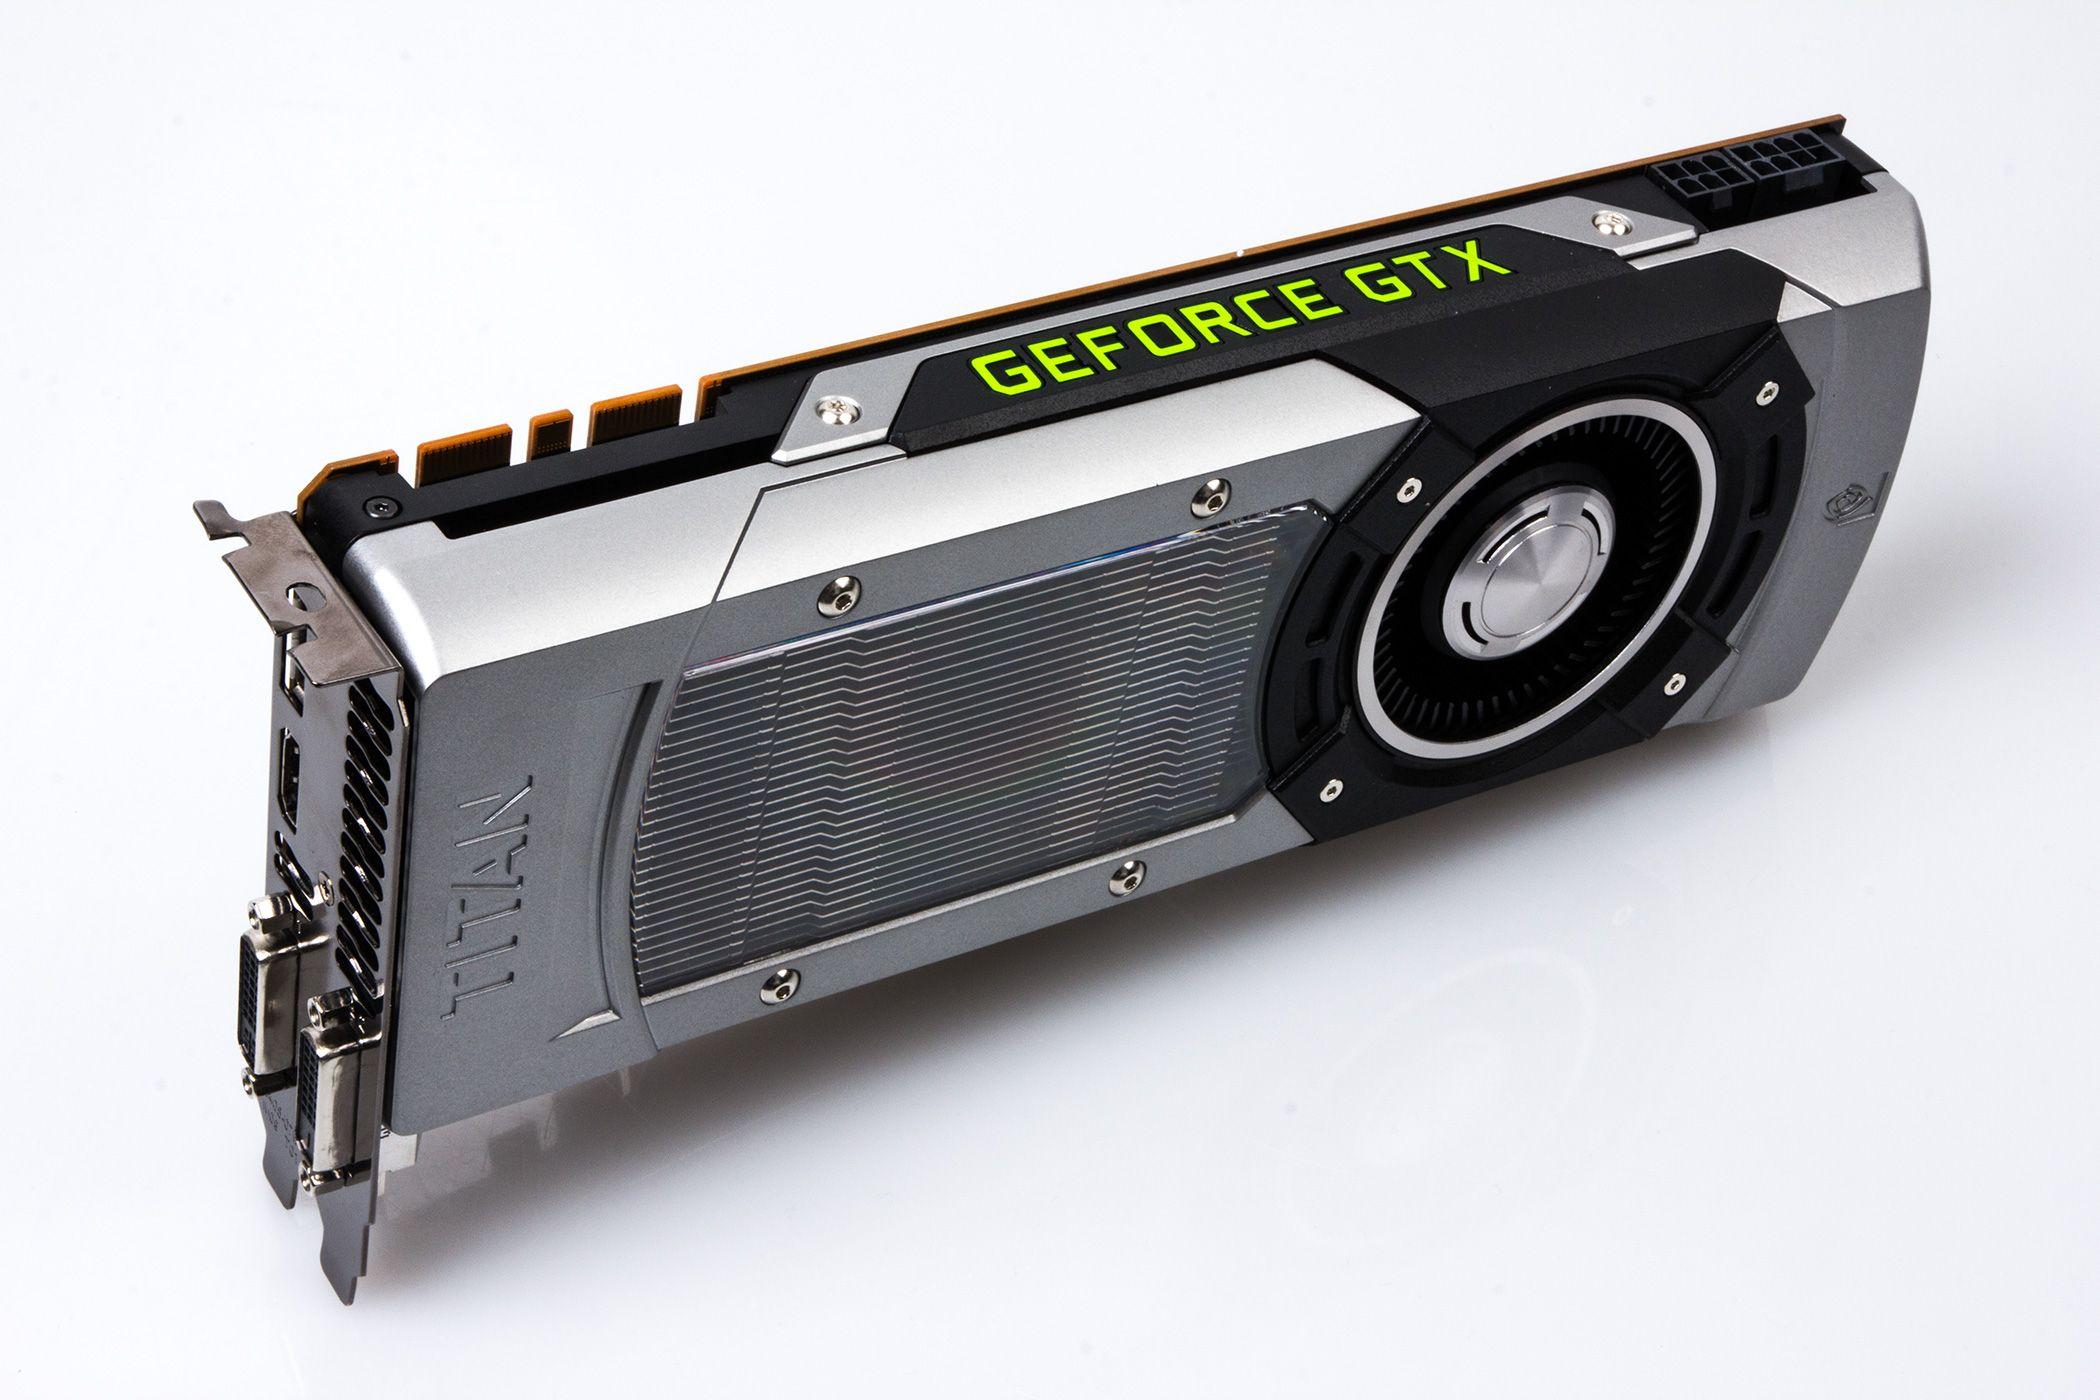 Nvidia GeForce GTX Titan.Foto: Varg Aamo, hardware.no